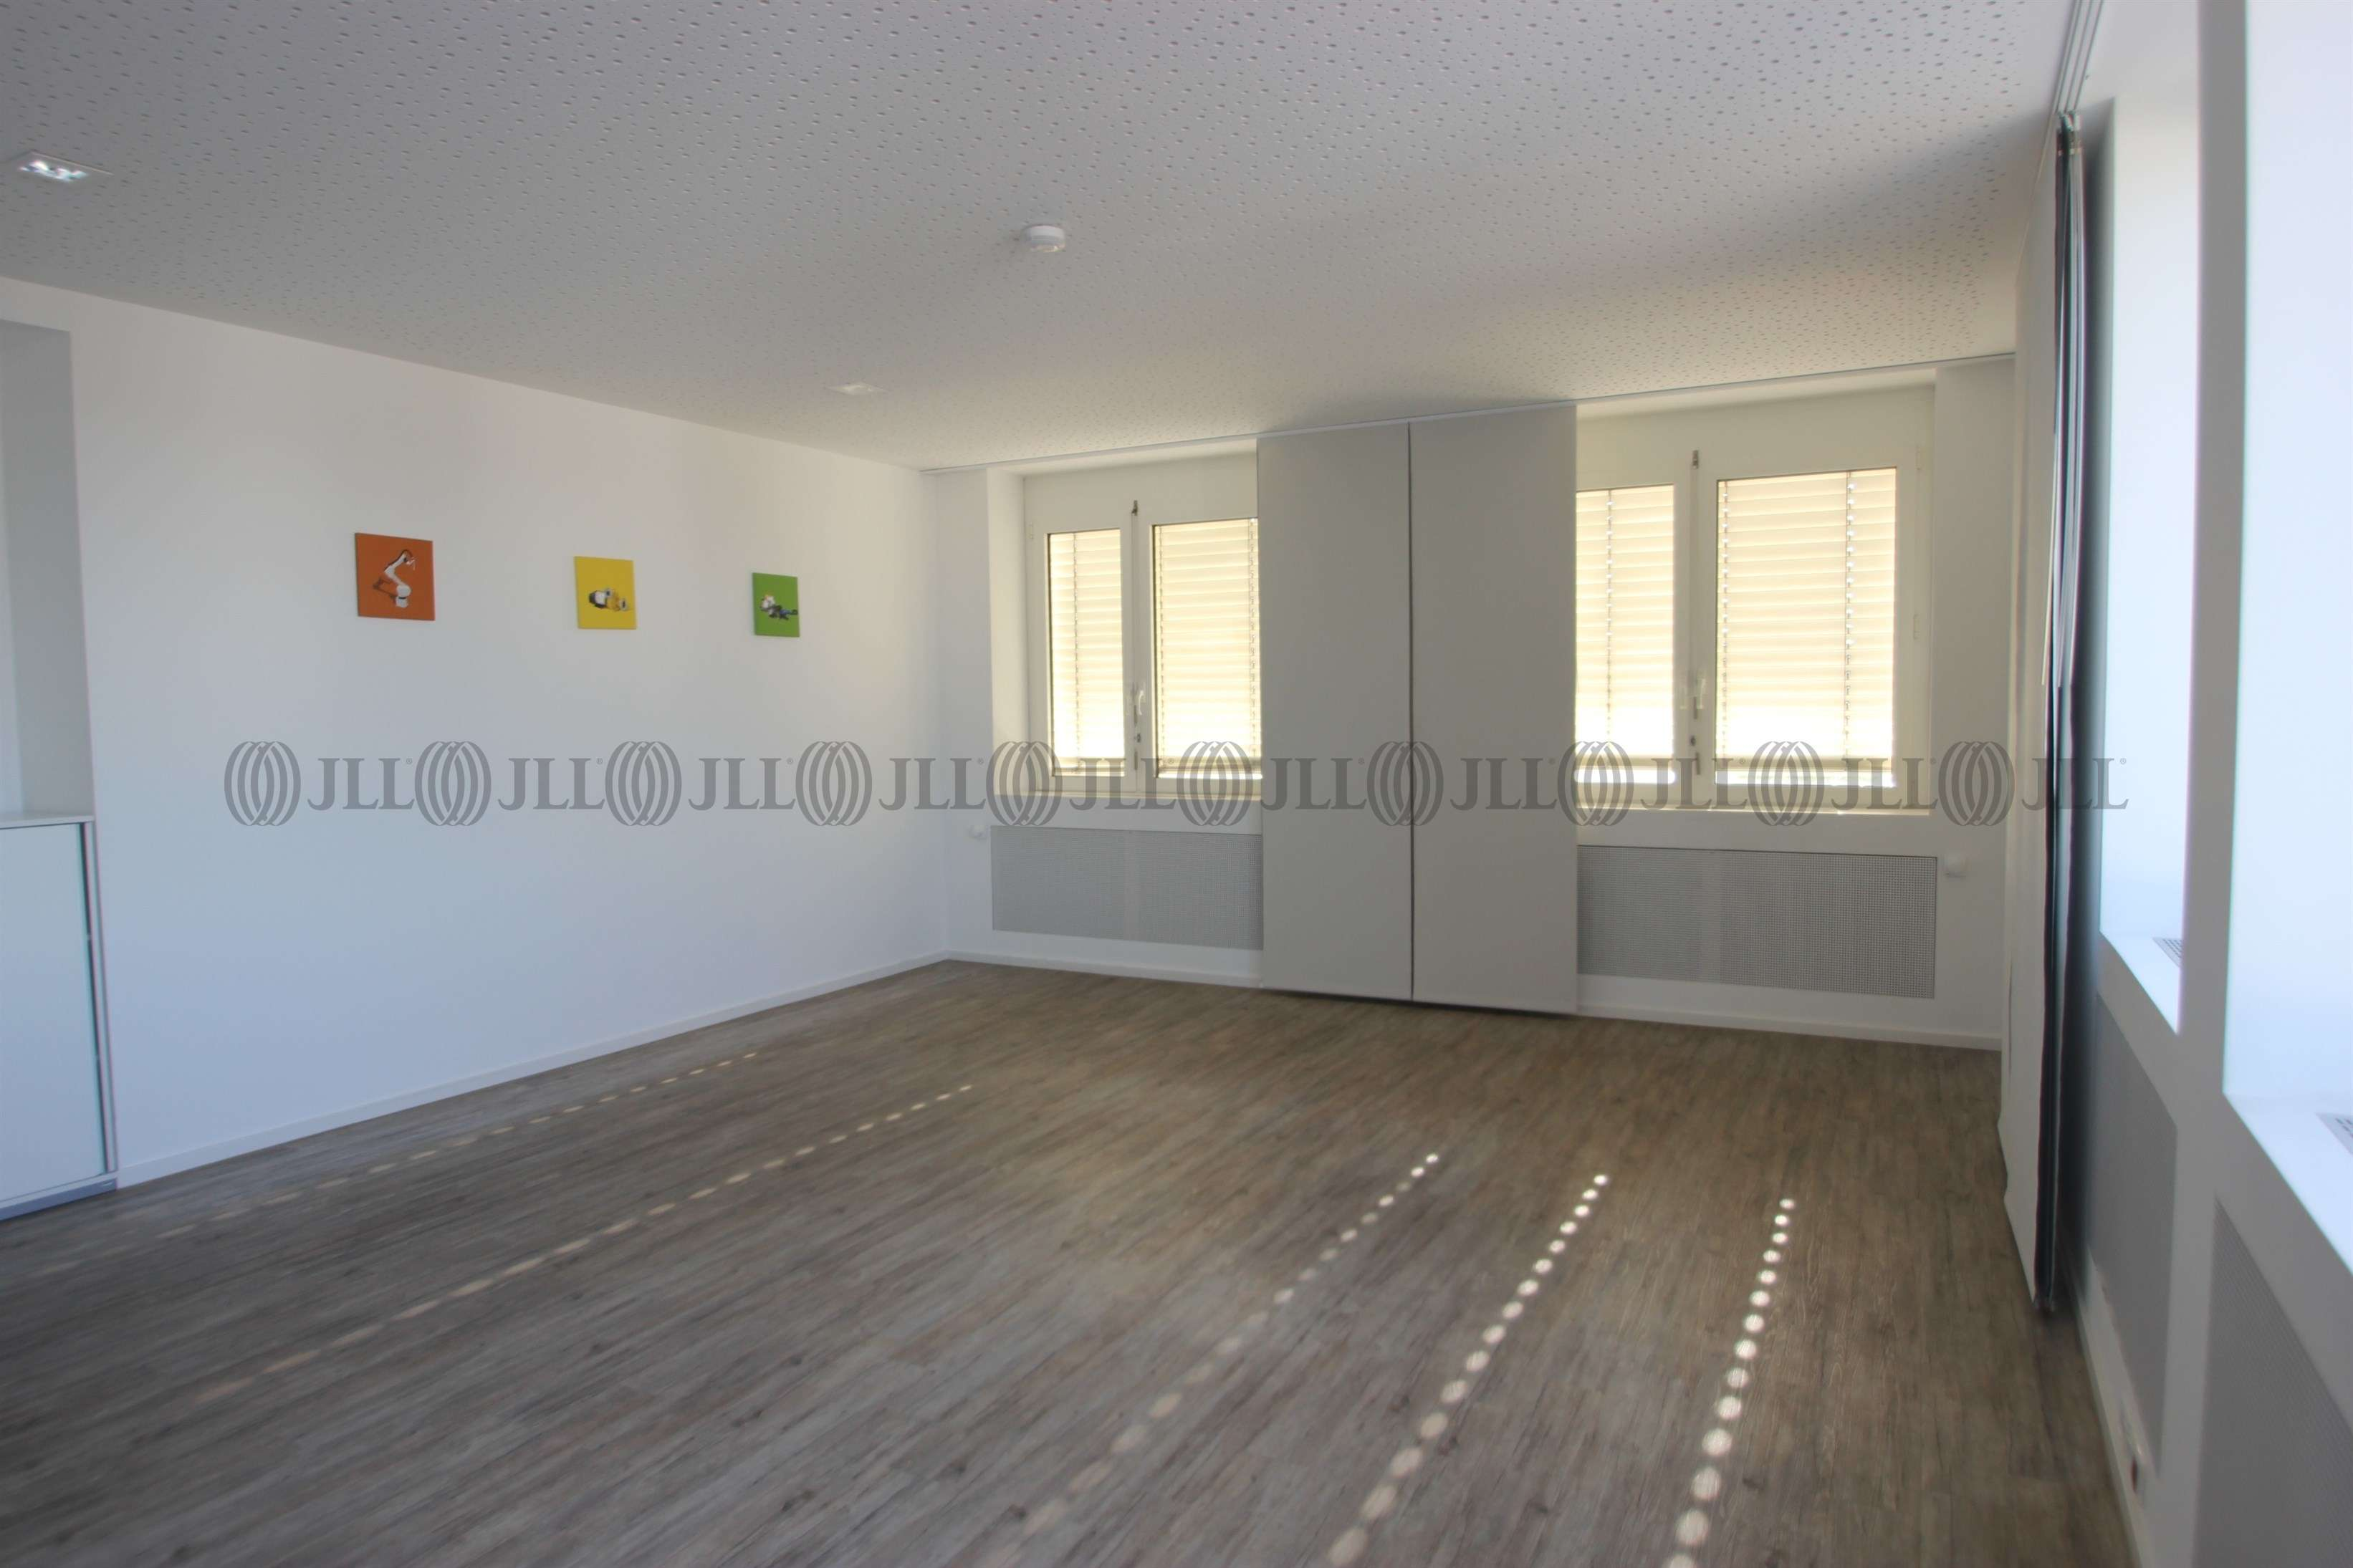 Büros Frankfurt am main, 60314 - Büro - Frankfurt am Main, Ostend - F1661 - 10046103